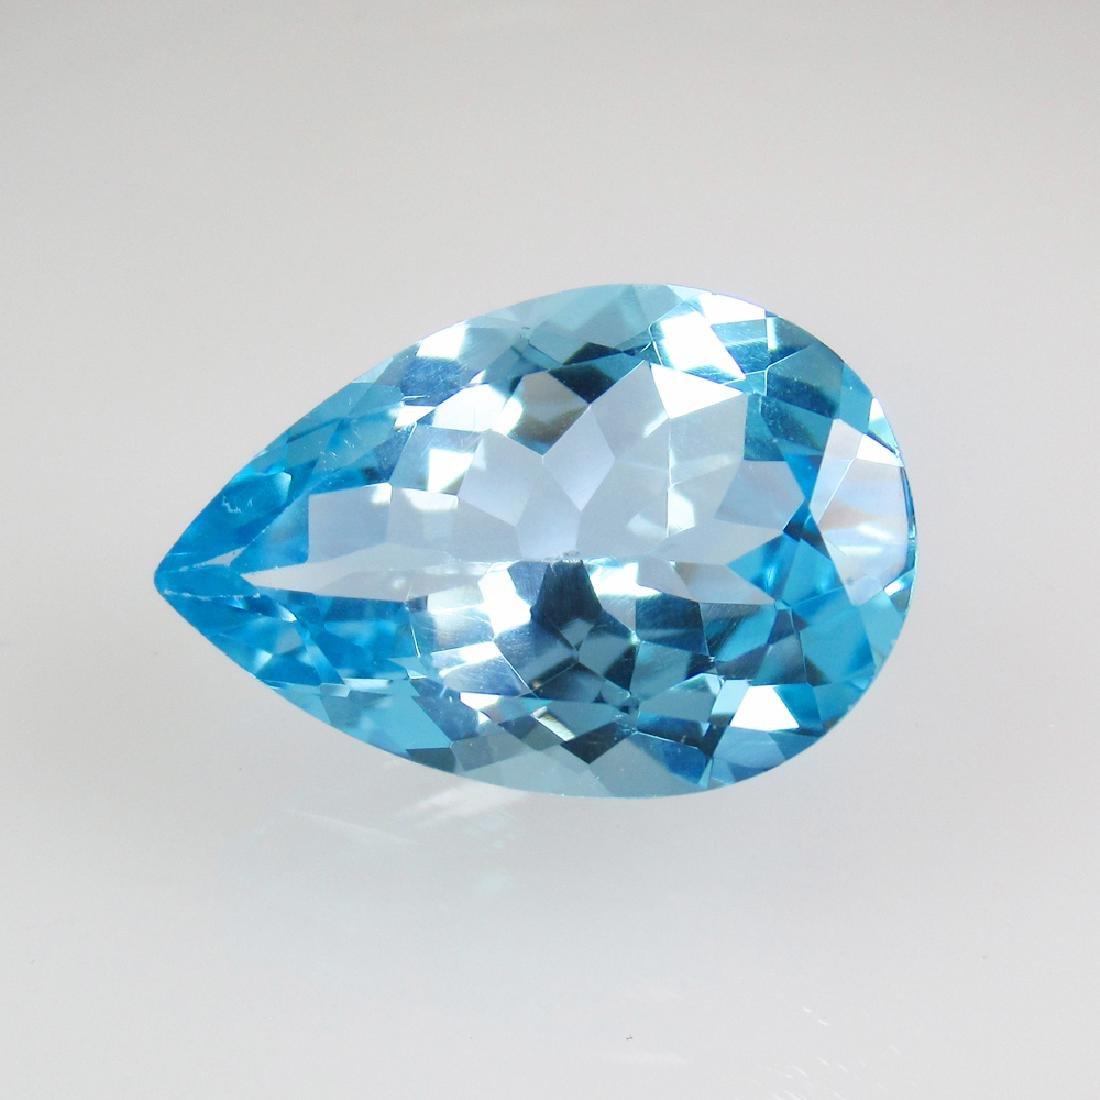 10.57 Ct Genuine Brazil Blue Topaz 18X12 mm Oval Cut